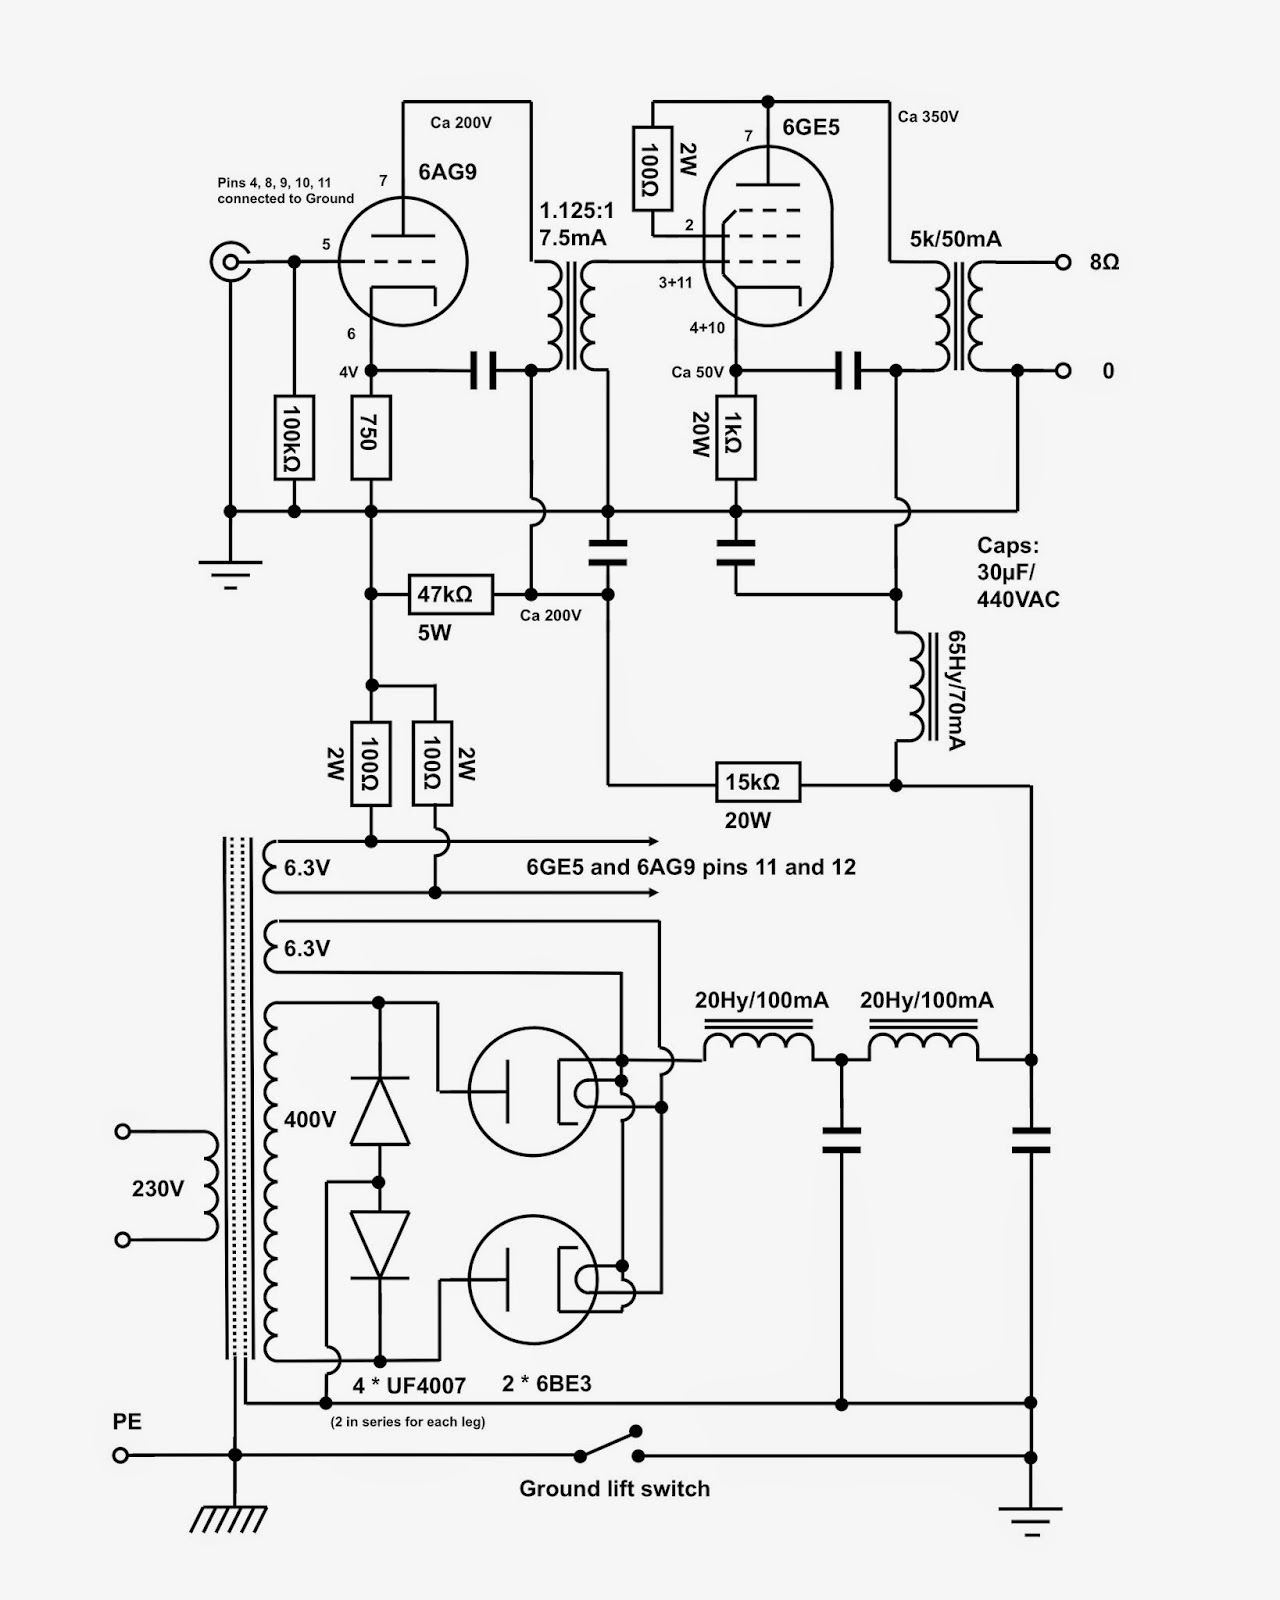 tube amp wiring diagram led tube light wiring diagram dual vinylsavor: 6ge5 mono amps, part 1 : circuit